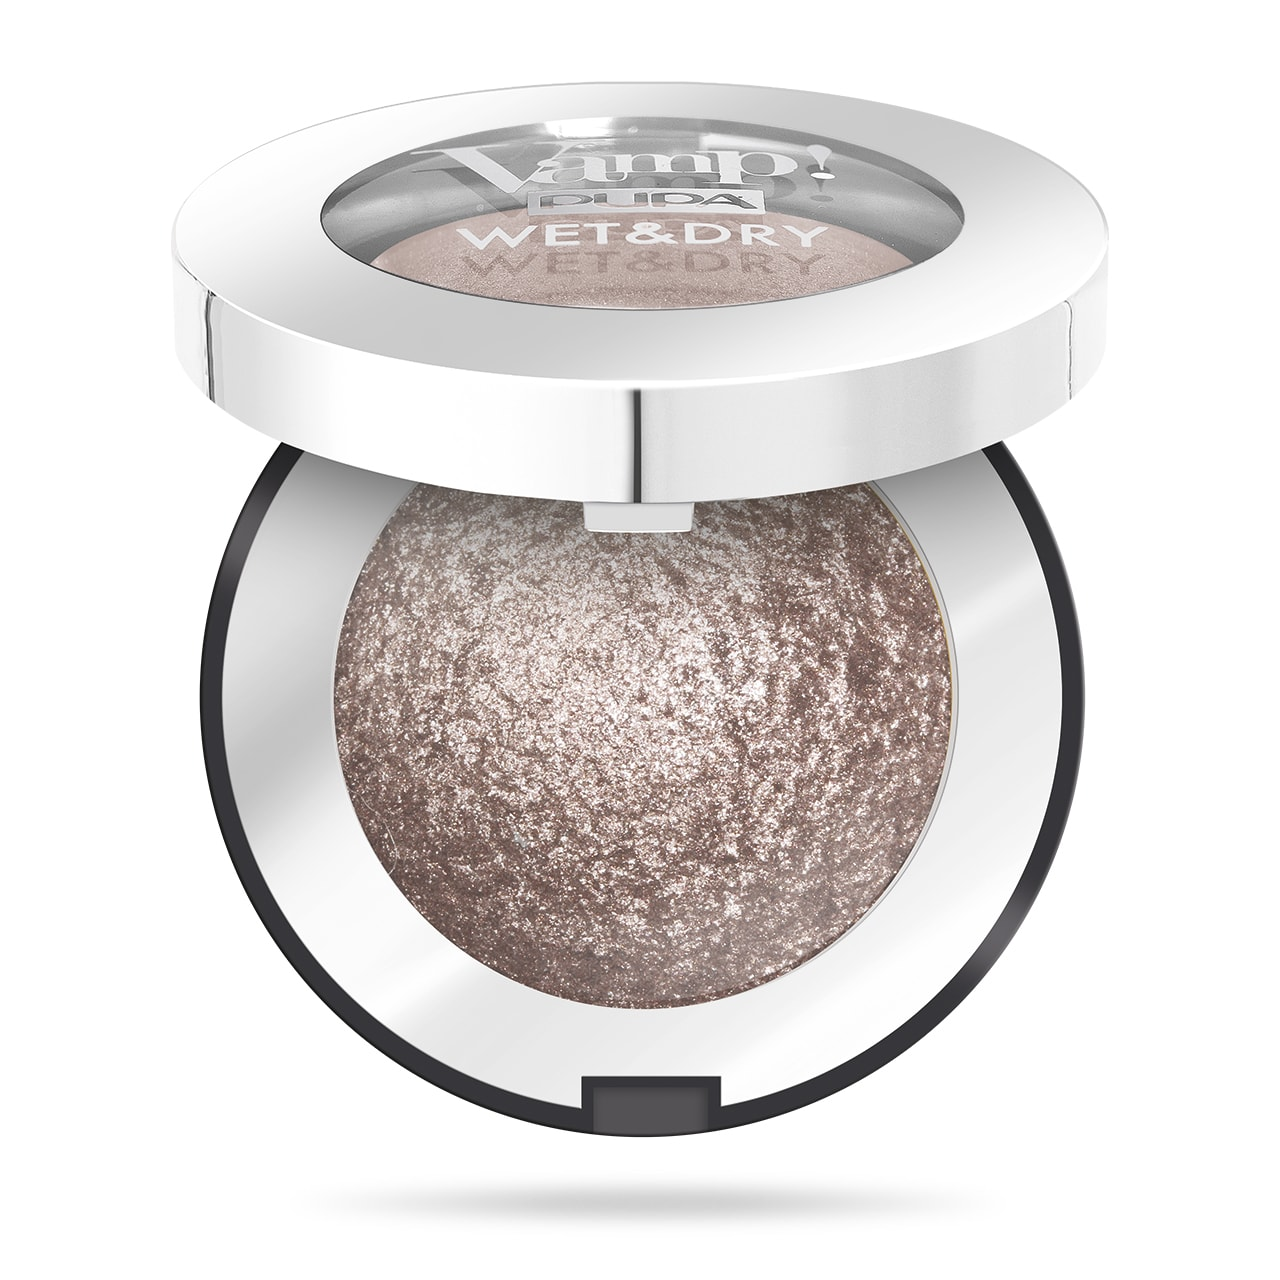 پوپا | PUPA - سایه چشم درخشان تک رنگ پوپا Vamp! Wet & Dry Eyeshadow 301